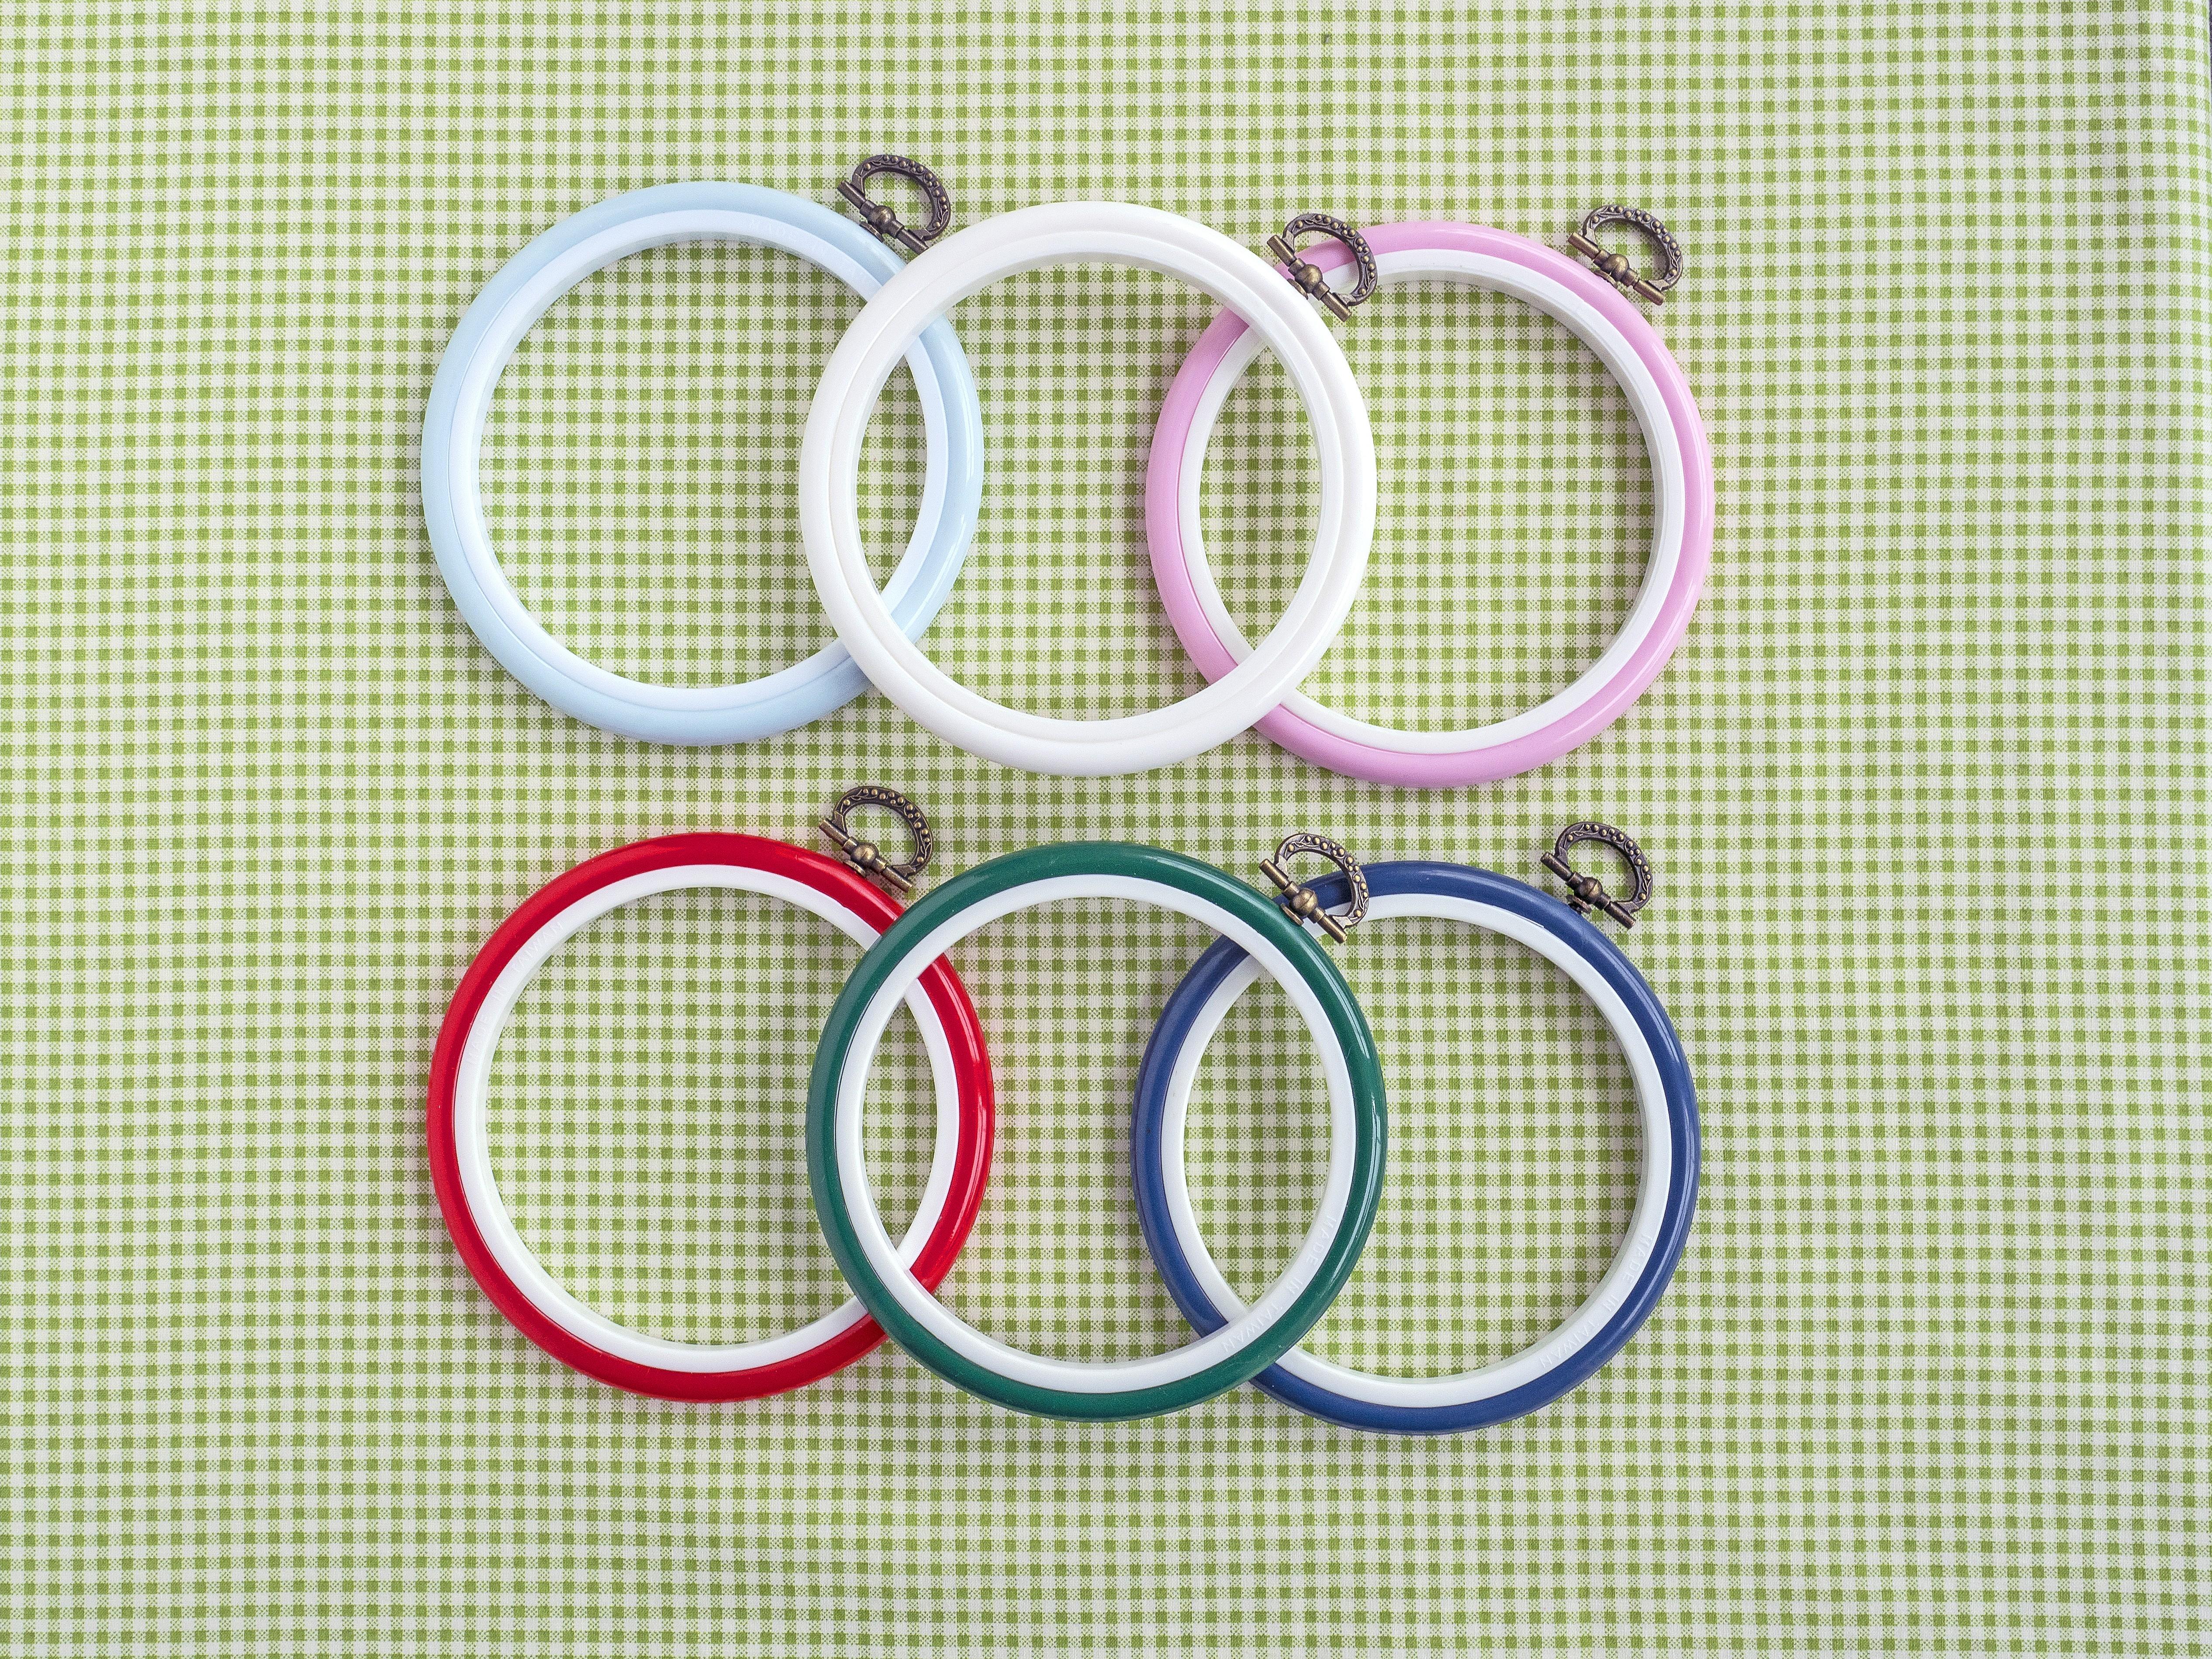 4 Inch Plastic Flexi-Hoop 3 Pack - Light